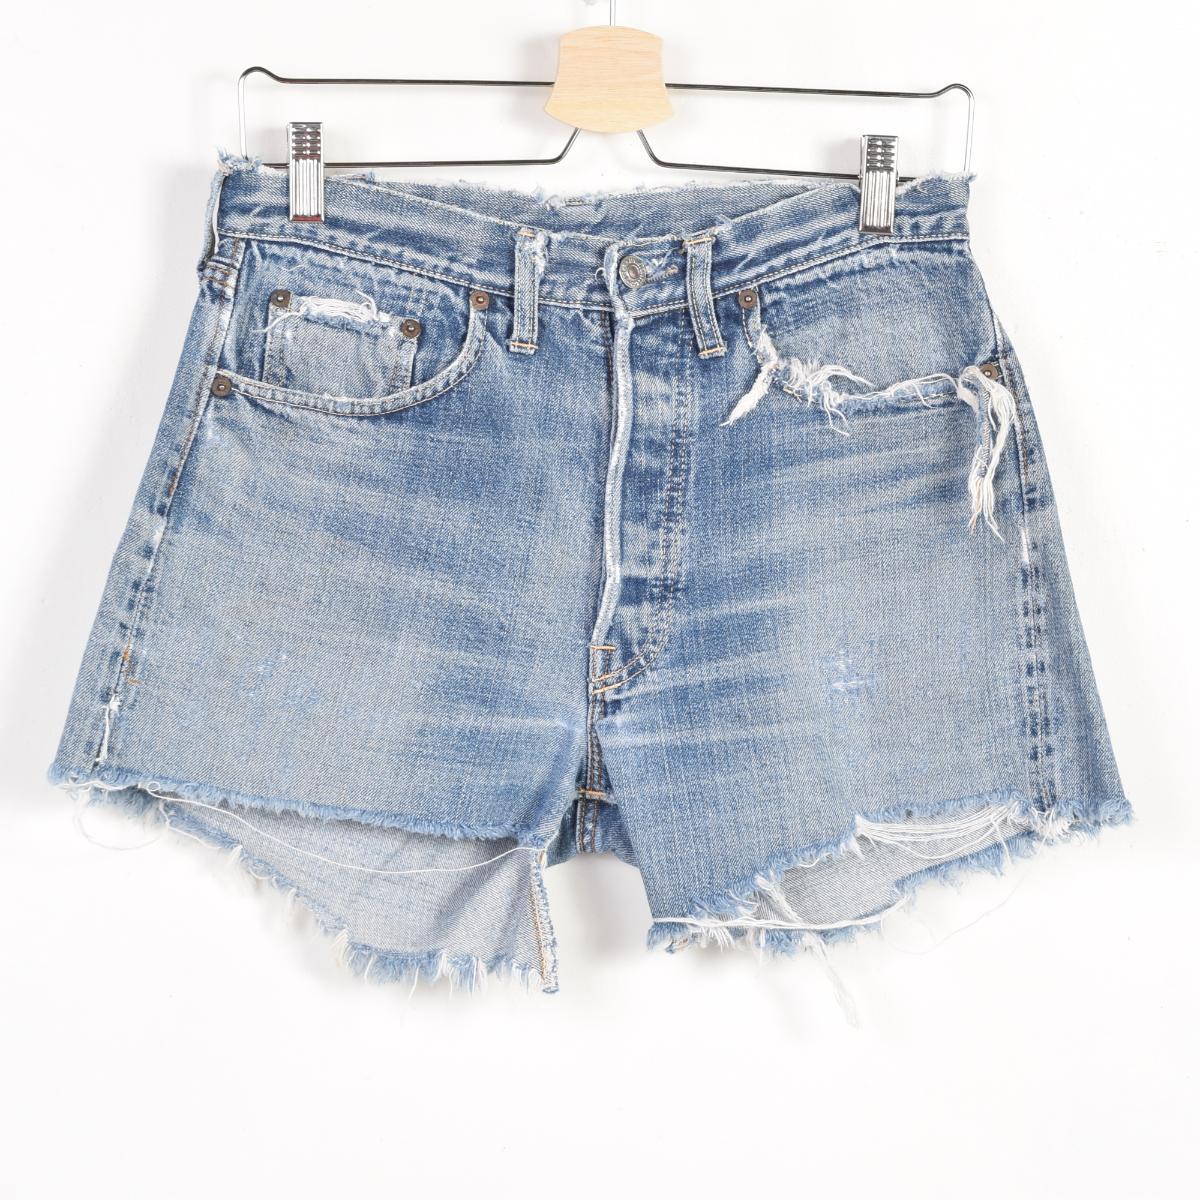 60s Levis 501 Big E BIG Cut Off Jeans Denim Underwear Men W31 Vintage Wad9233